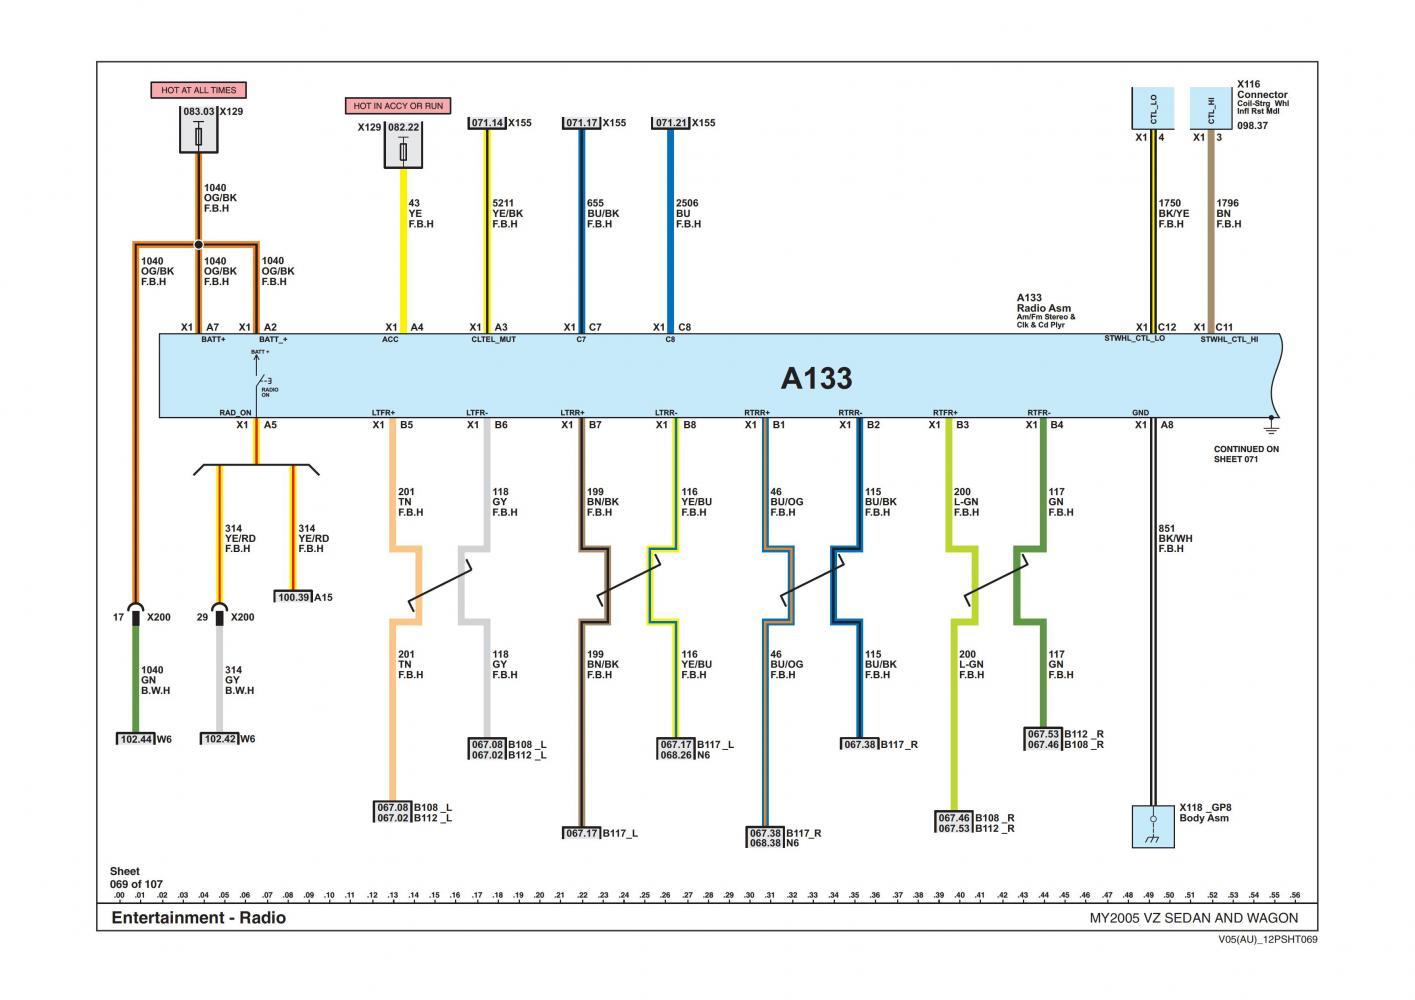 FN_3406] Wiring Diagram For Vt Commodore Radio Schematic WiringIfica Hendil Xero Mohammedshrine Librar Wiring 101